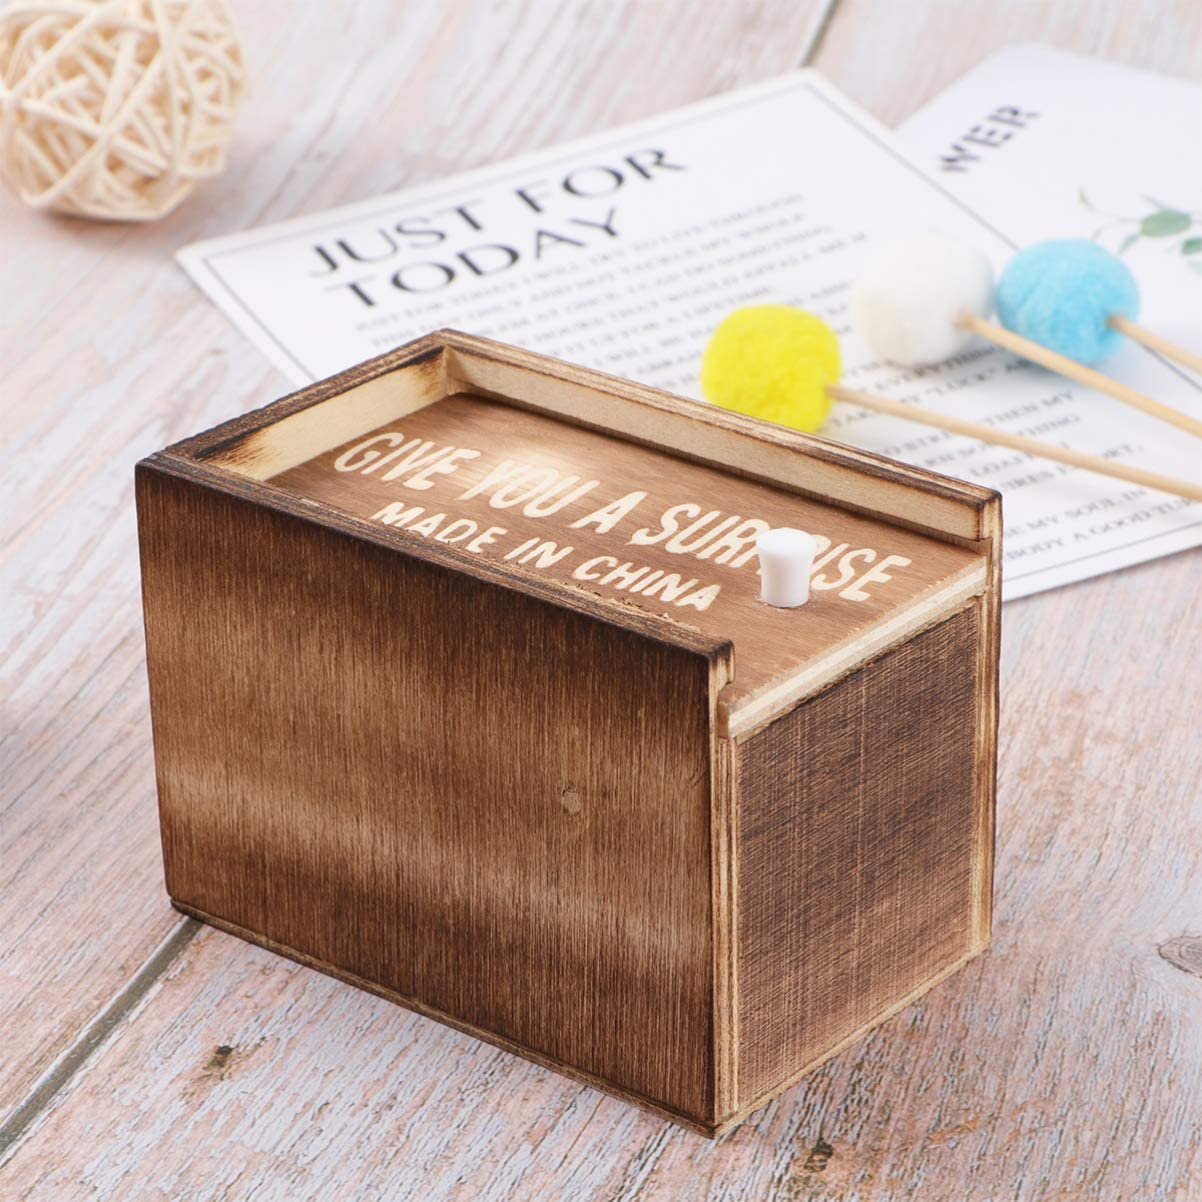 Toyvian Caja de Broma de ara/ña Caja de Madera hilarante Broma de Juguete Caja de Regalo de Dinero Divertido Juguete Sorpresa para ni/ños ni/ñas Adultos